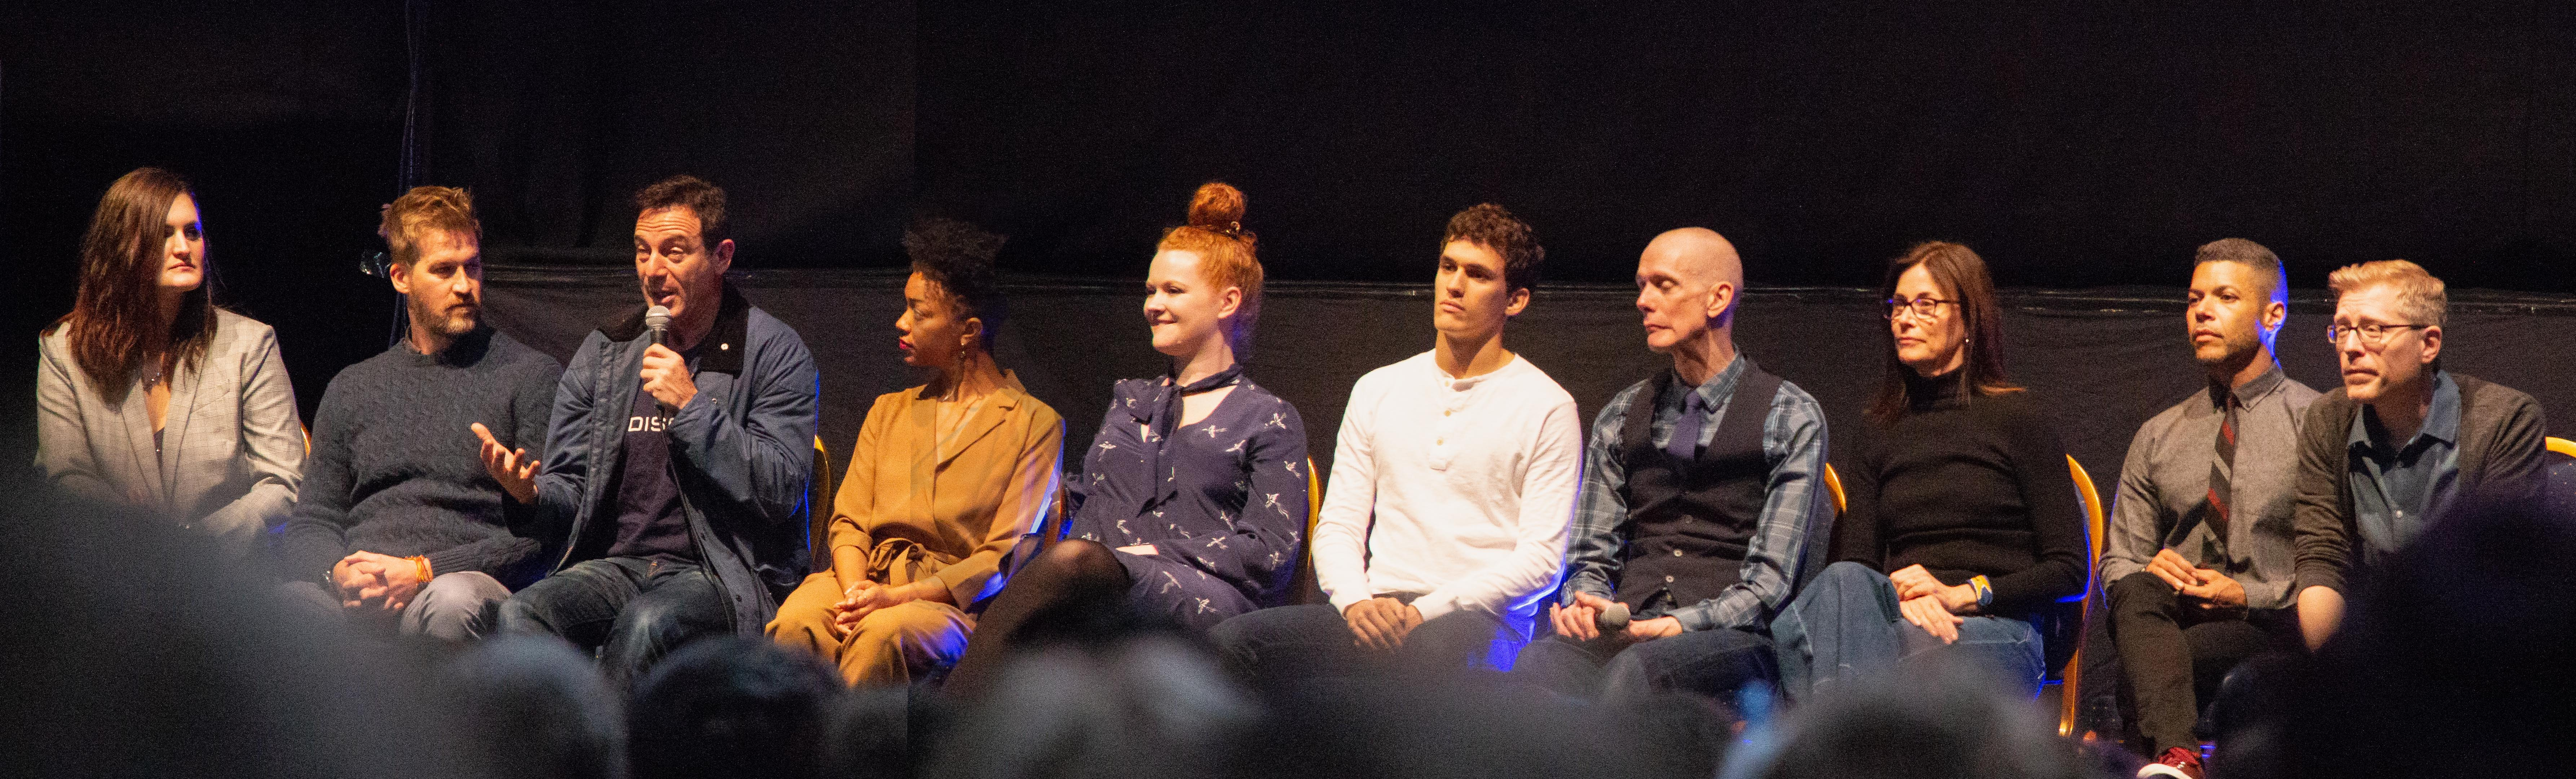 The crew of Star Trek Discovery